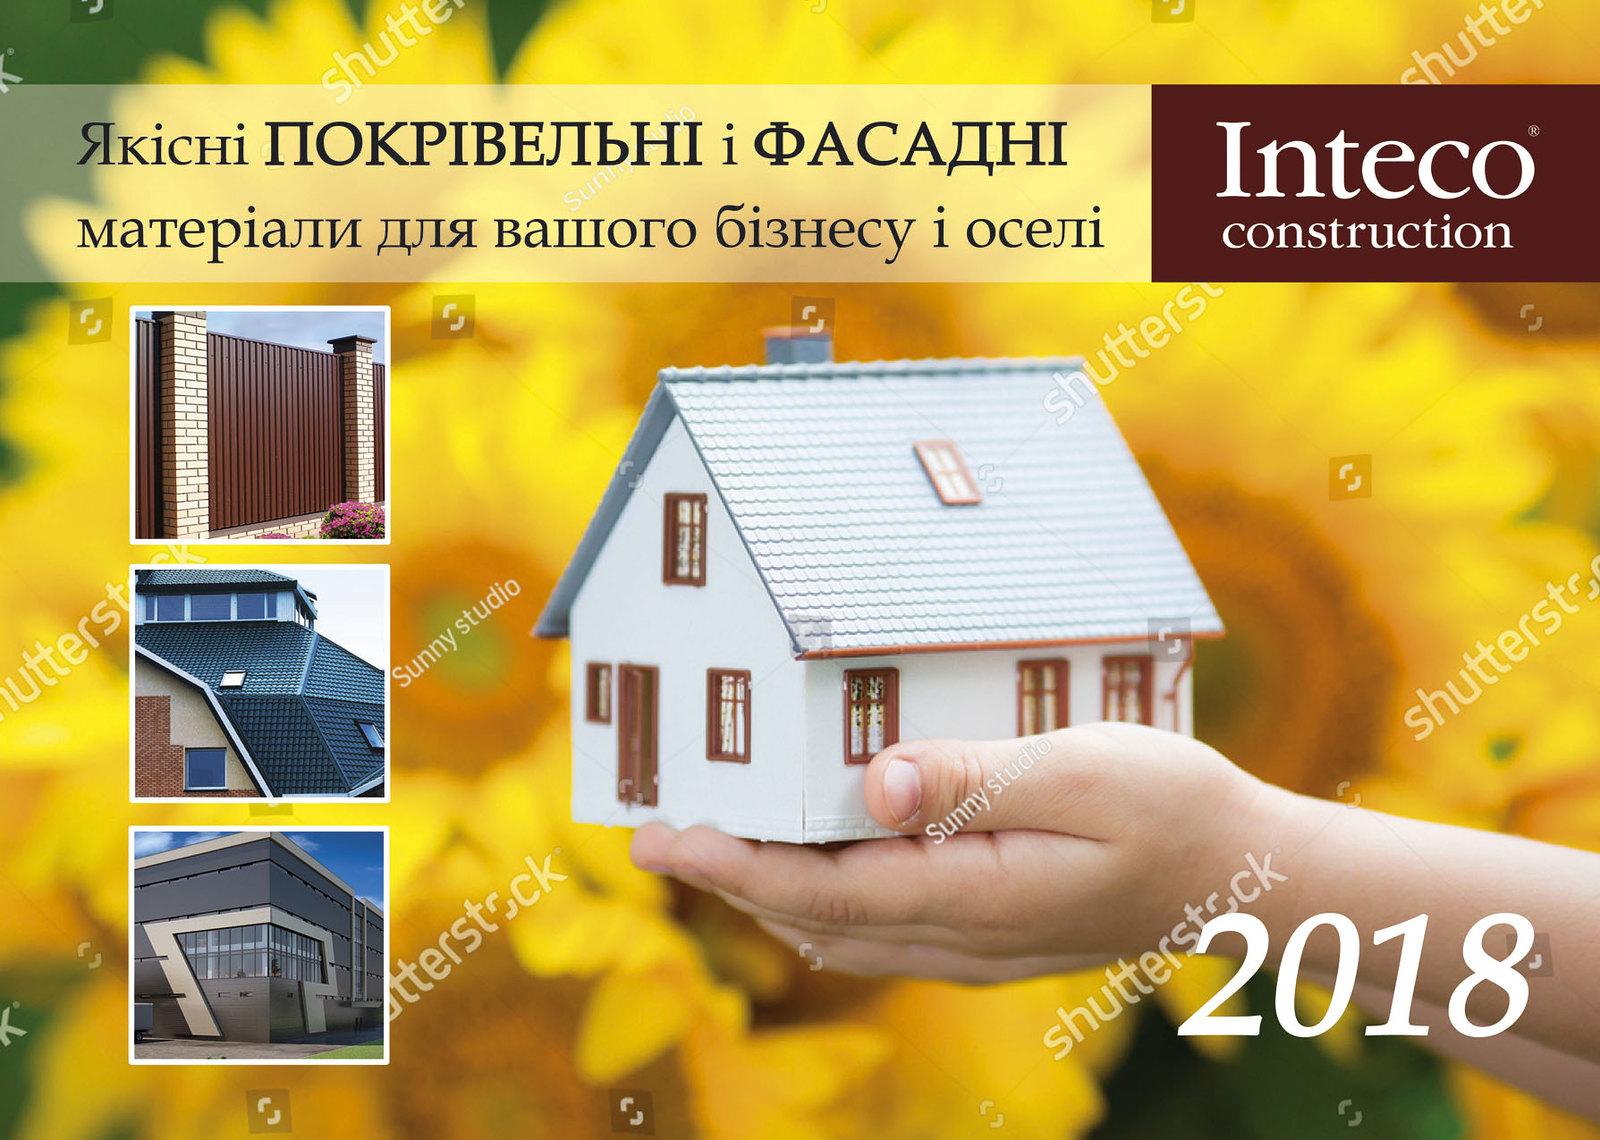 (01) Kalend Inteco 01 verh 02